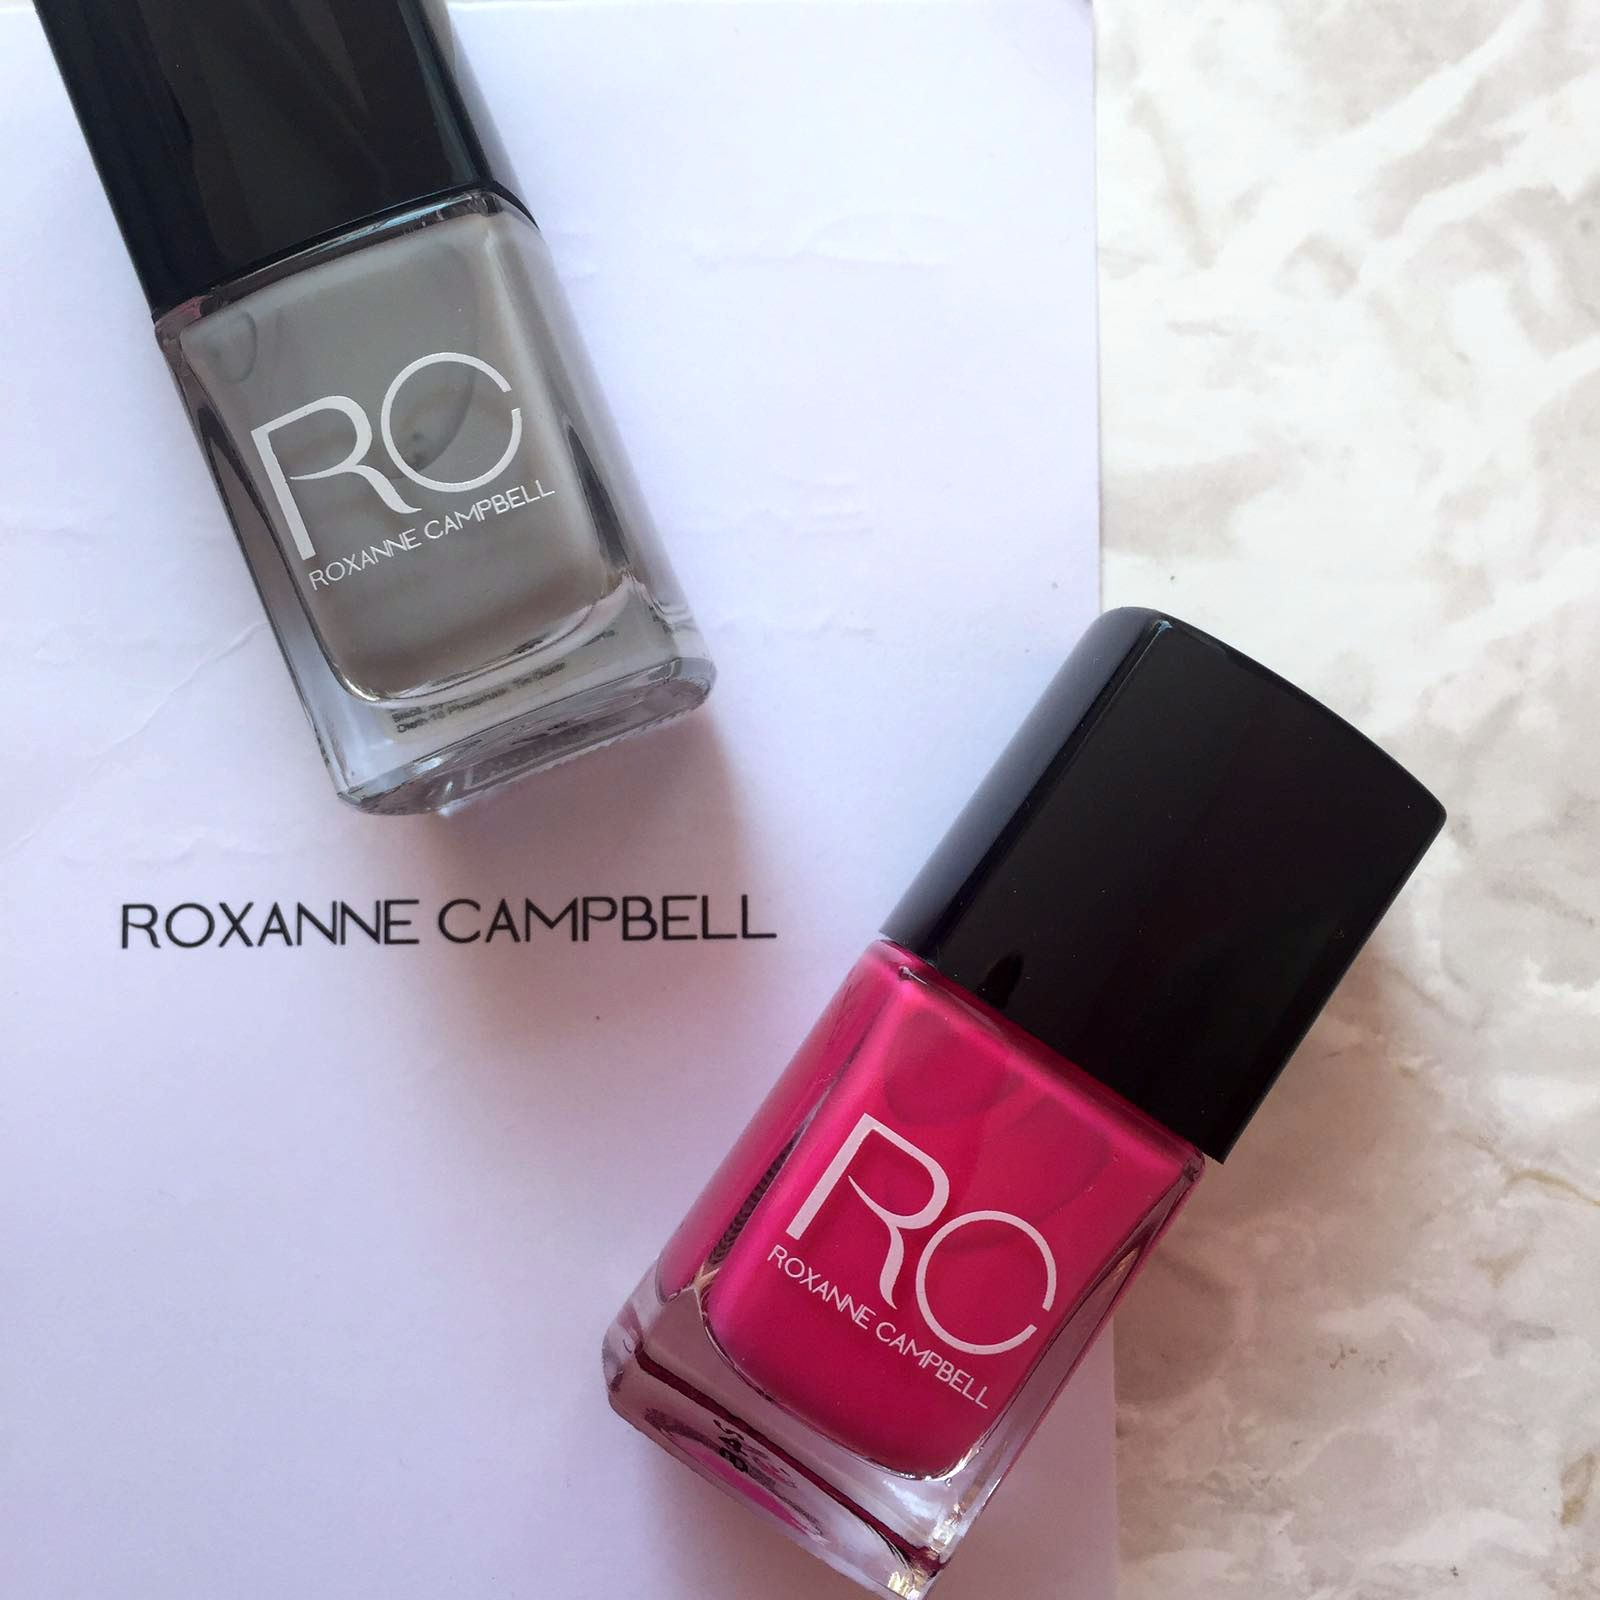 A New Nail Polish Brand - Roxanne Campbell | Nail polish brands and ...